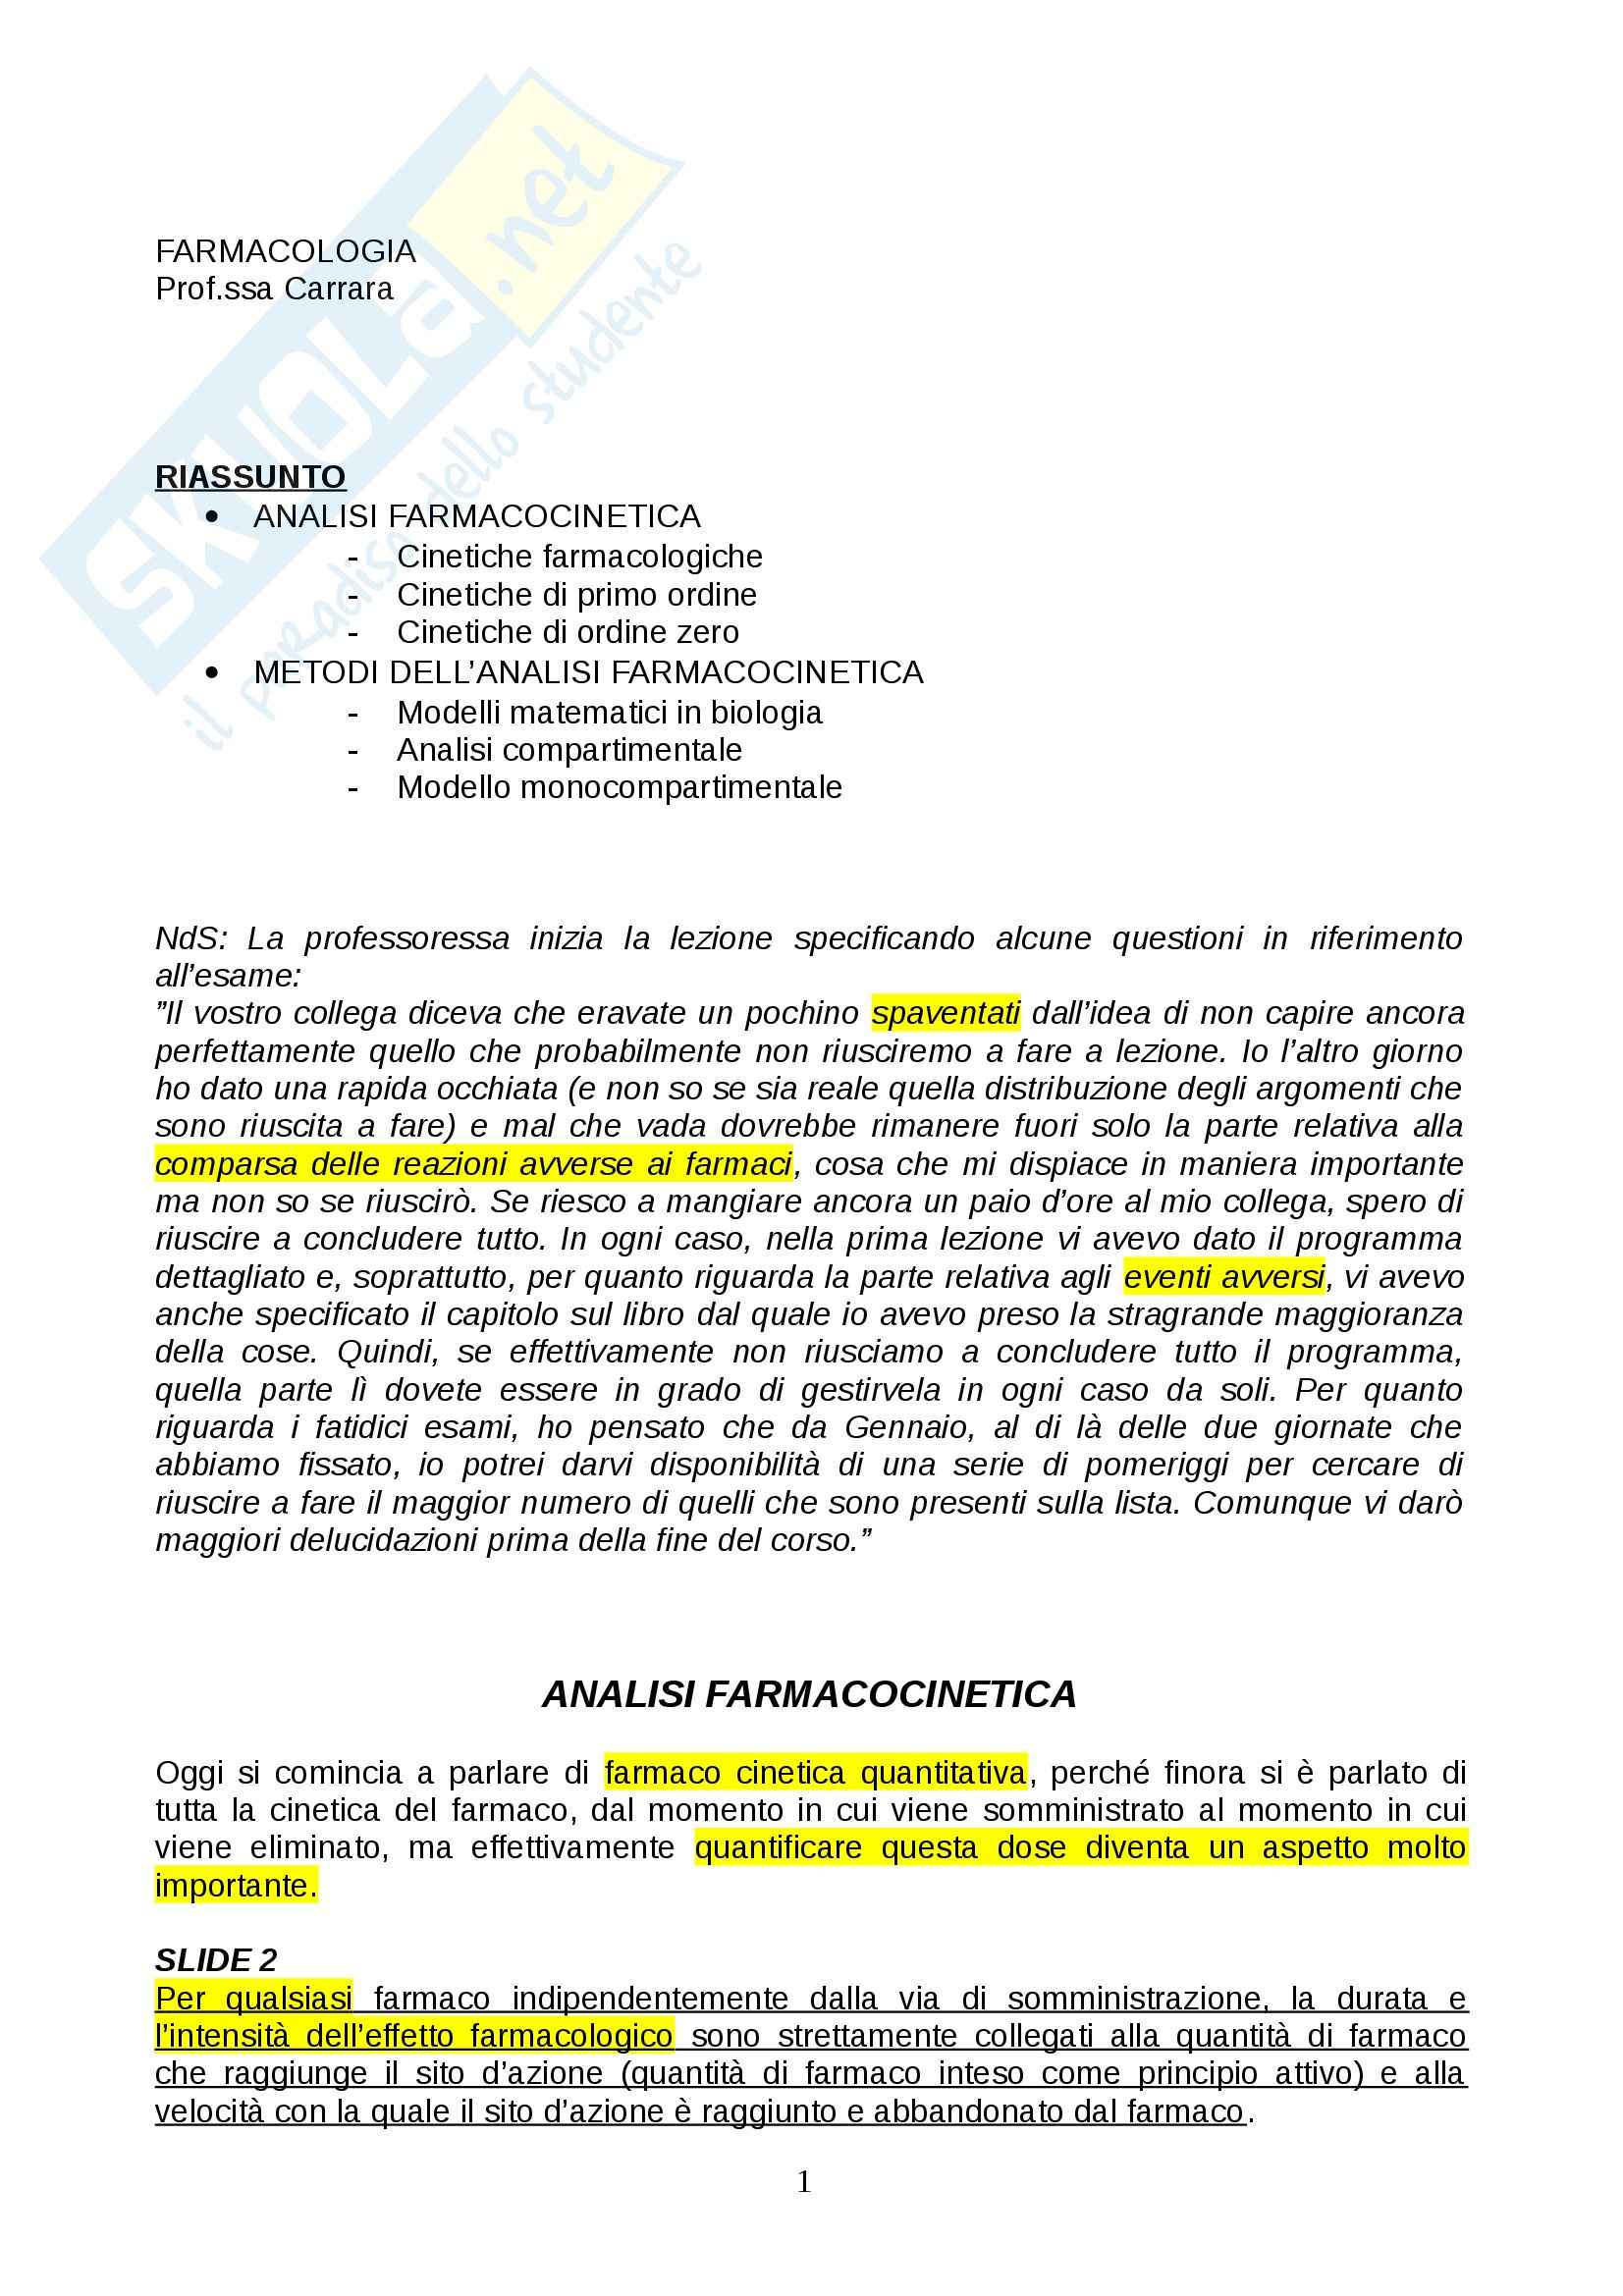 appunto M. Carrara Farmacologia